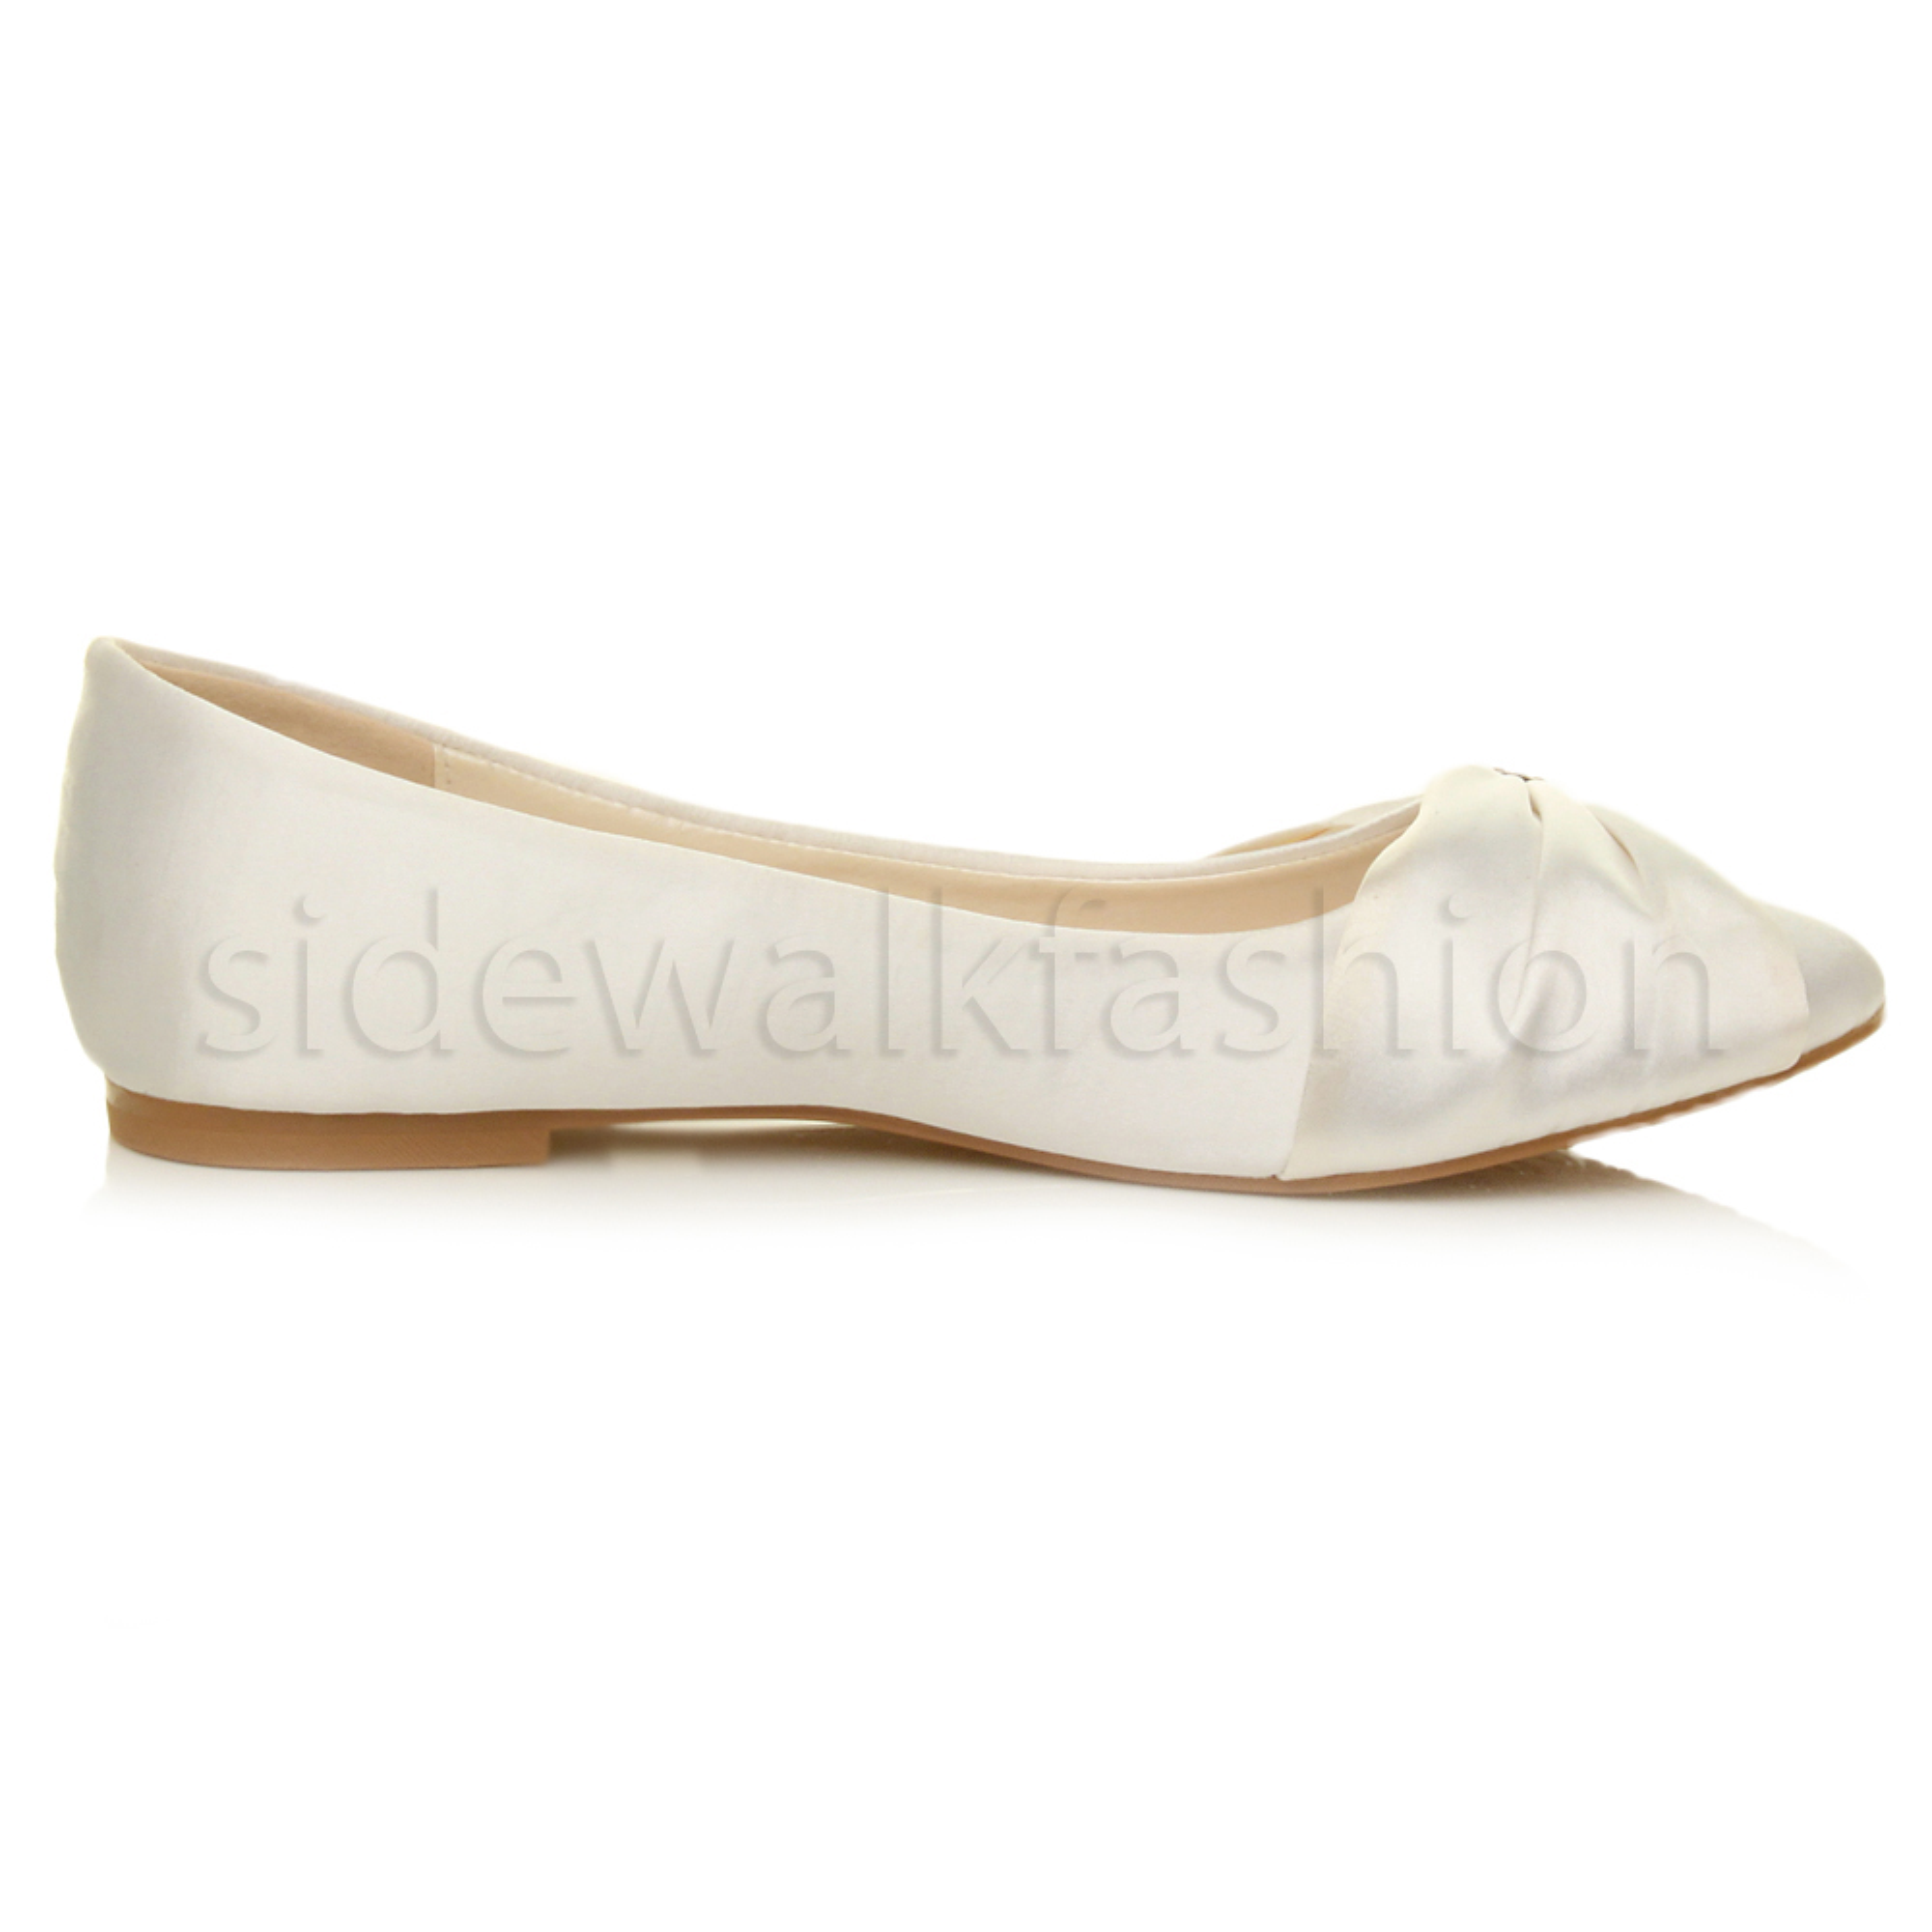 Womens-ladies-flat-wedding-bridesmaid-ruched-diamante-bridal-shoes-pumps-size thumbnail 36